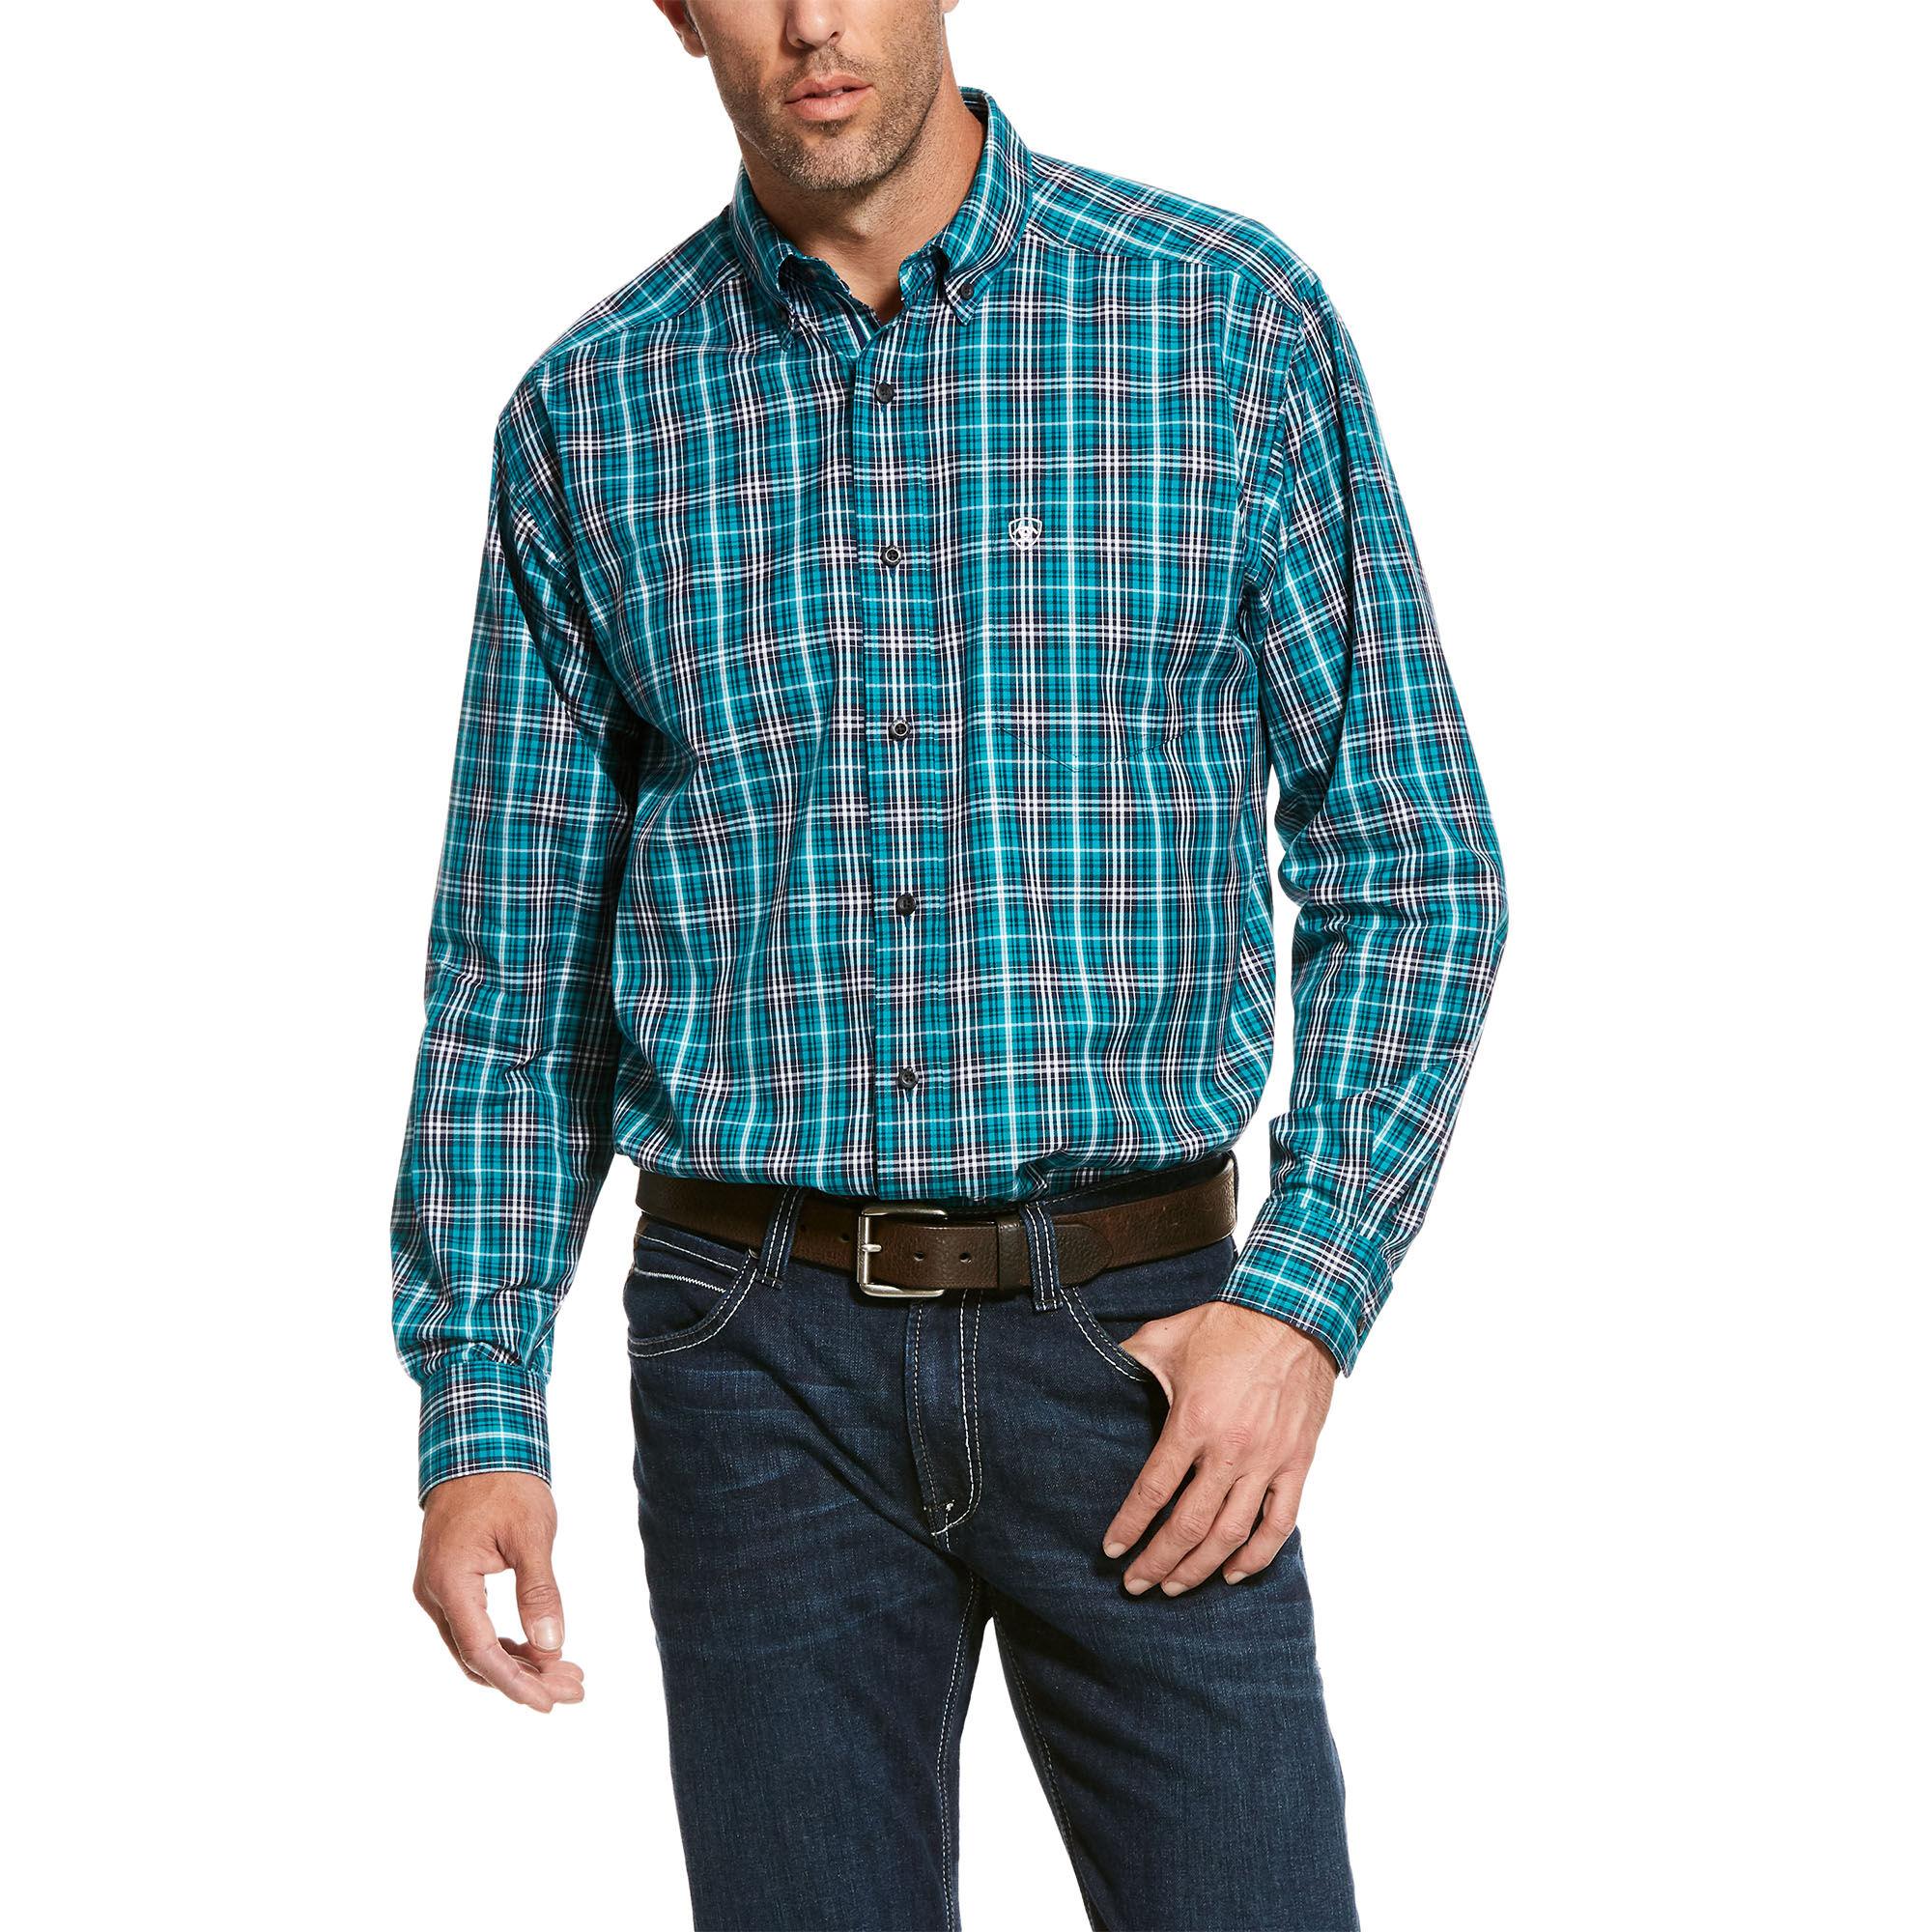 ARIAT Mens Pro Series Ronaldson Stretch Classic Fit Shirt